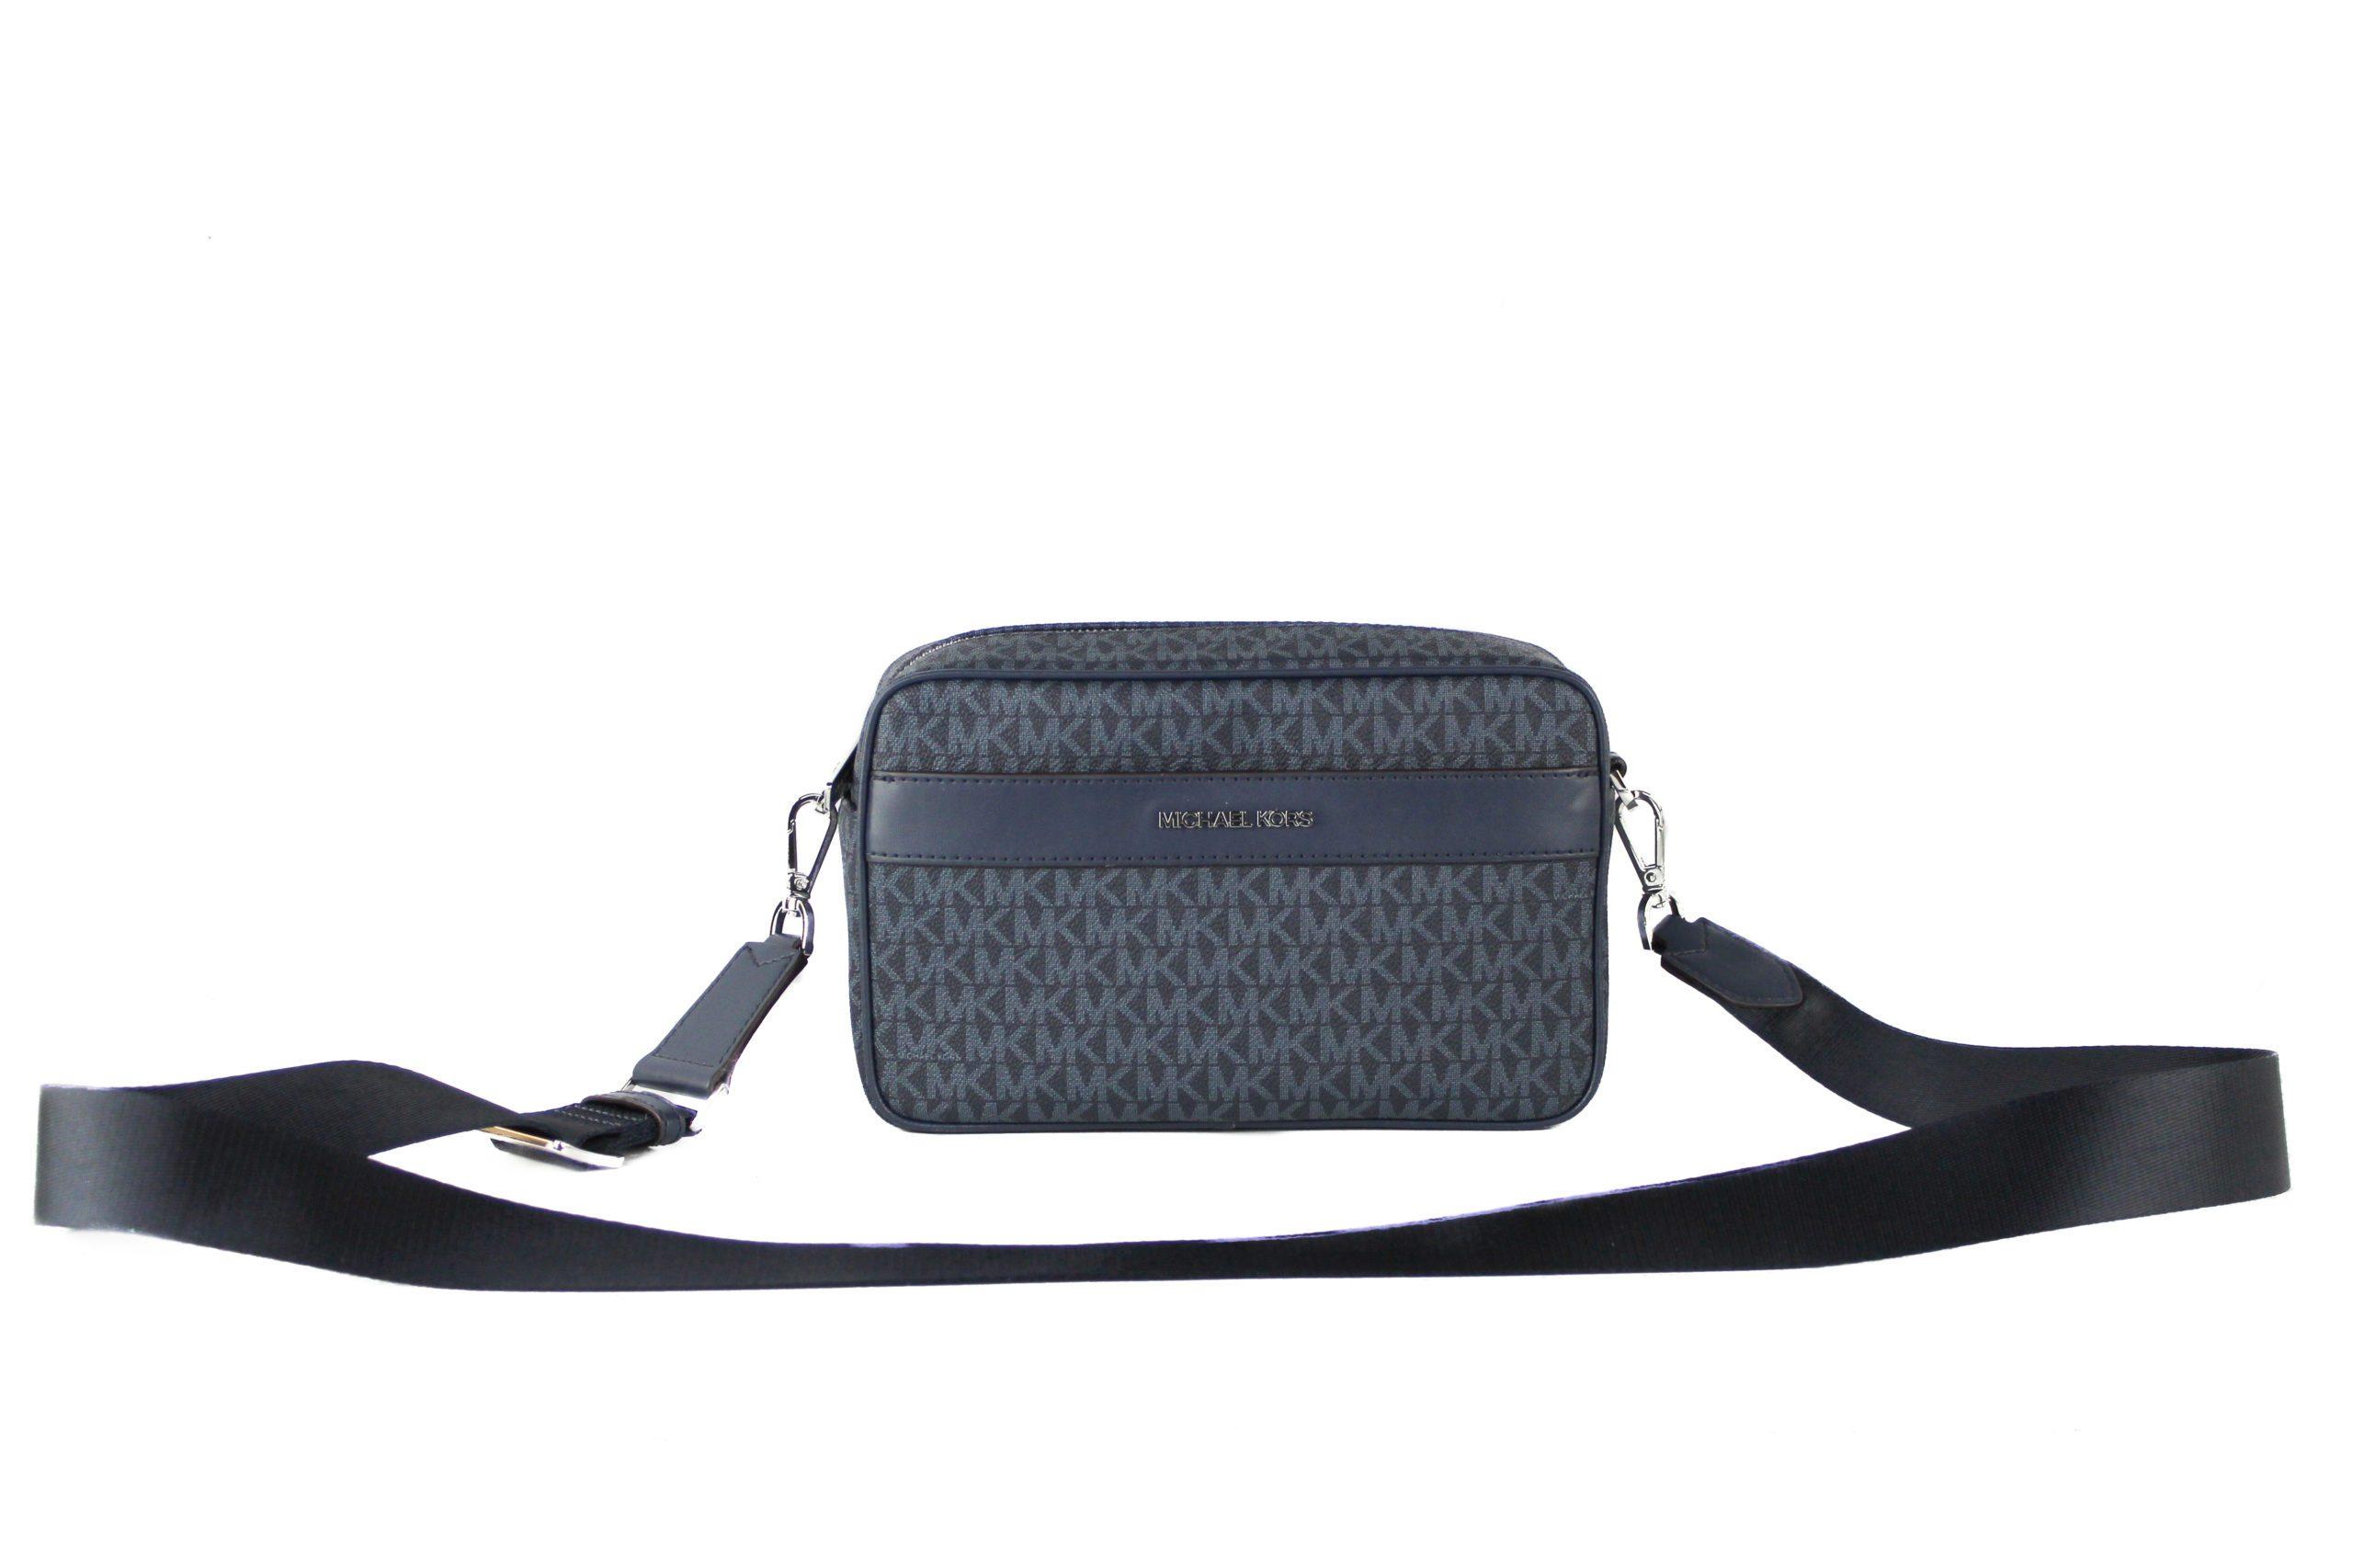 Michael Kors Women's Kenly Crossbody Bag Blue 80489